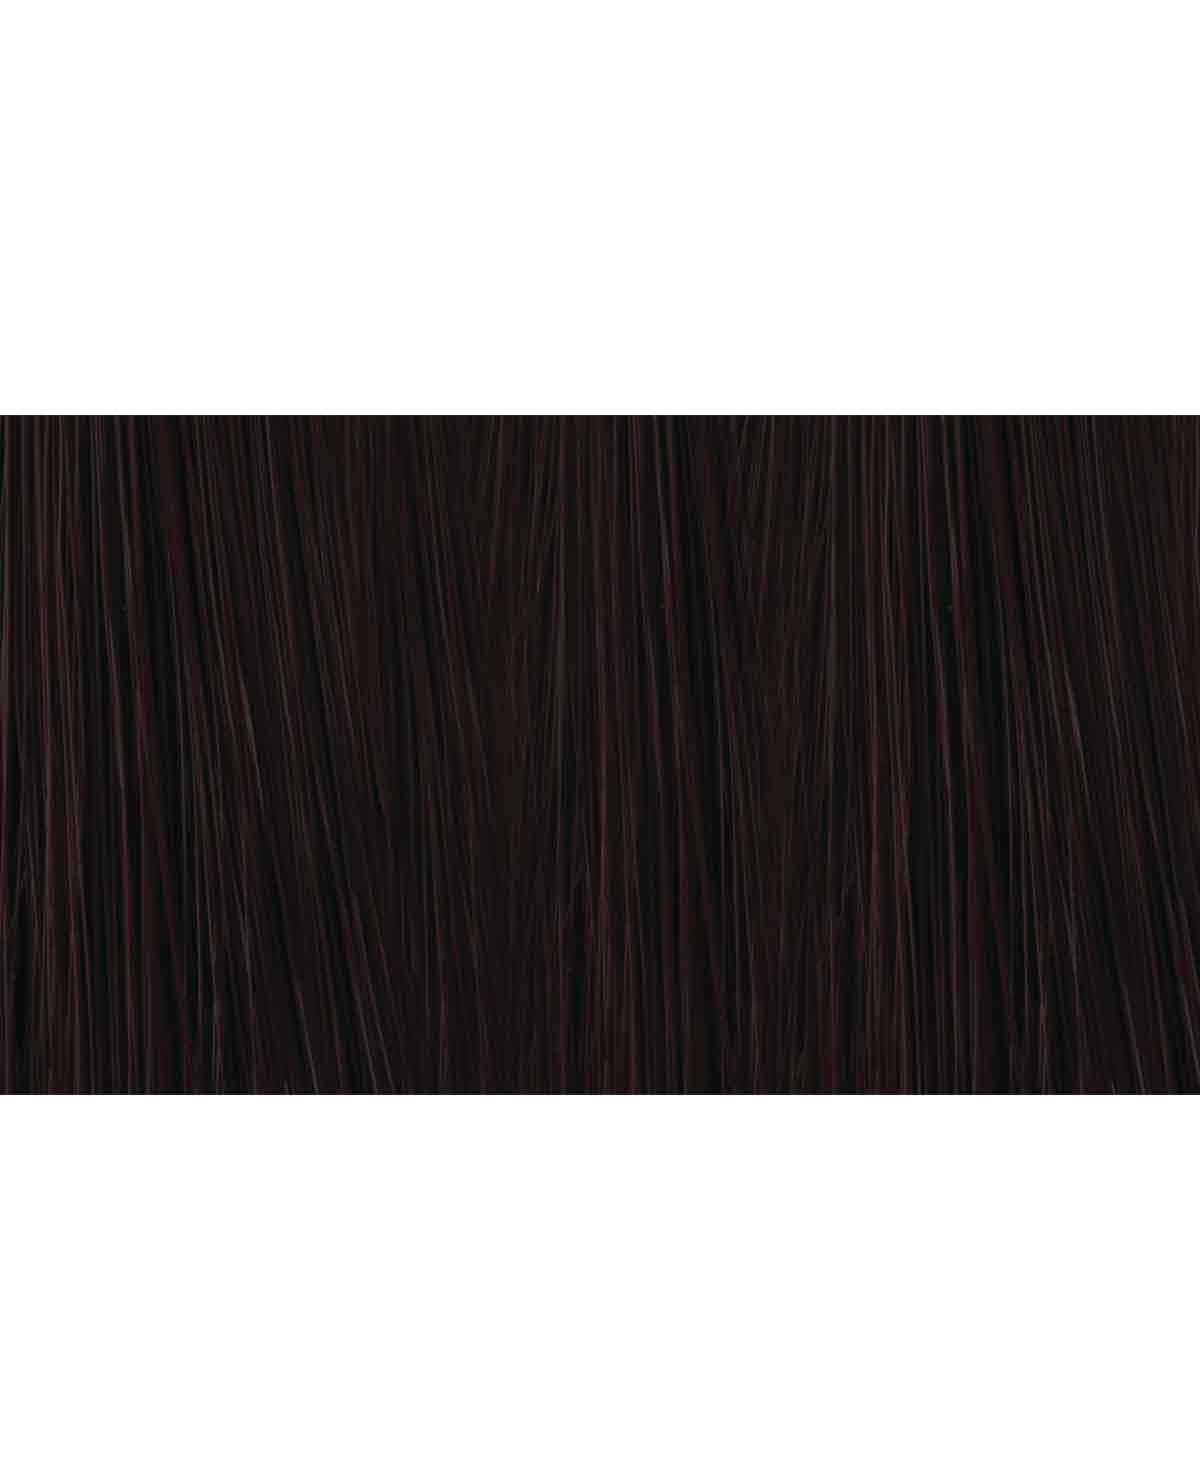 color.me 4.7 / 4ch Medium.Brown.Chocolate